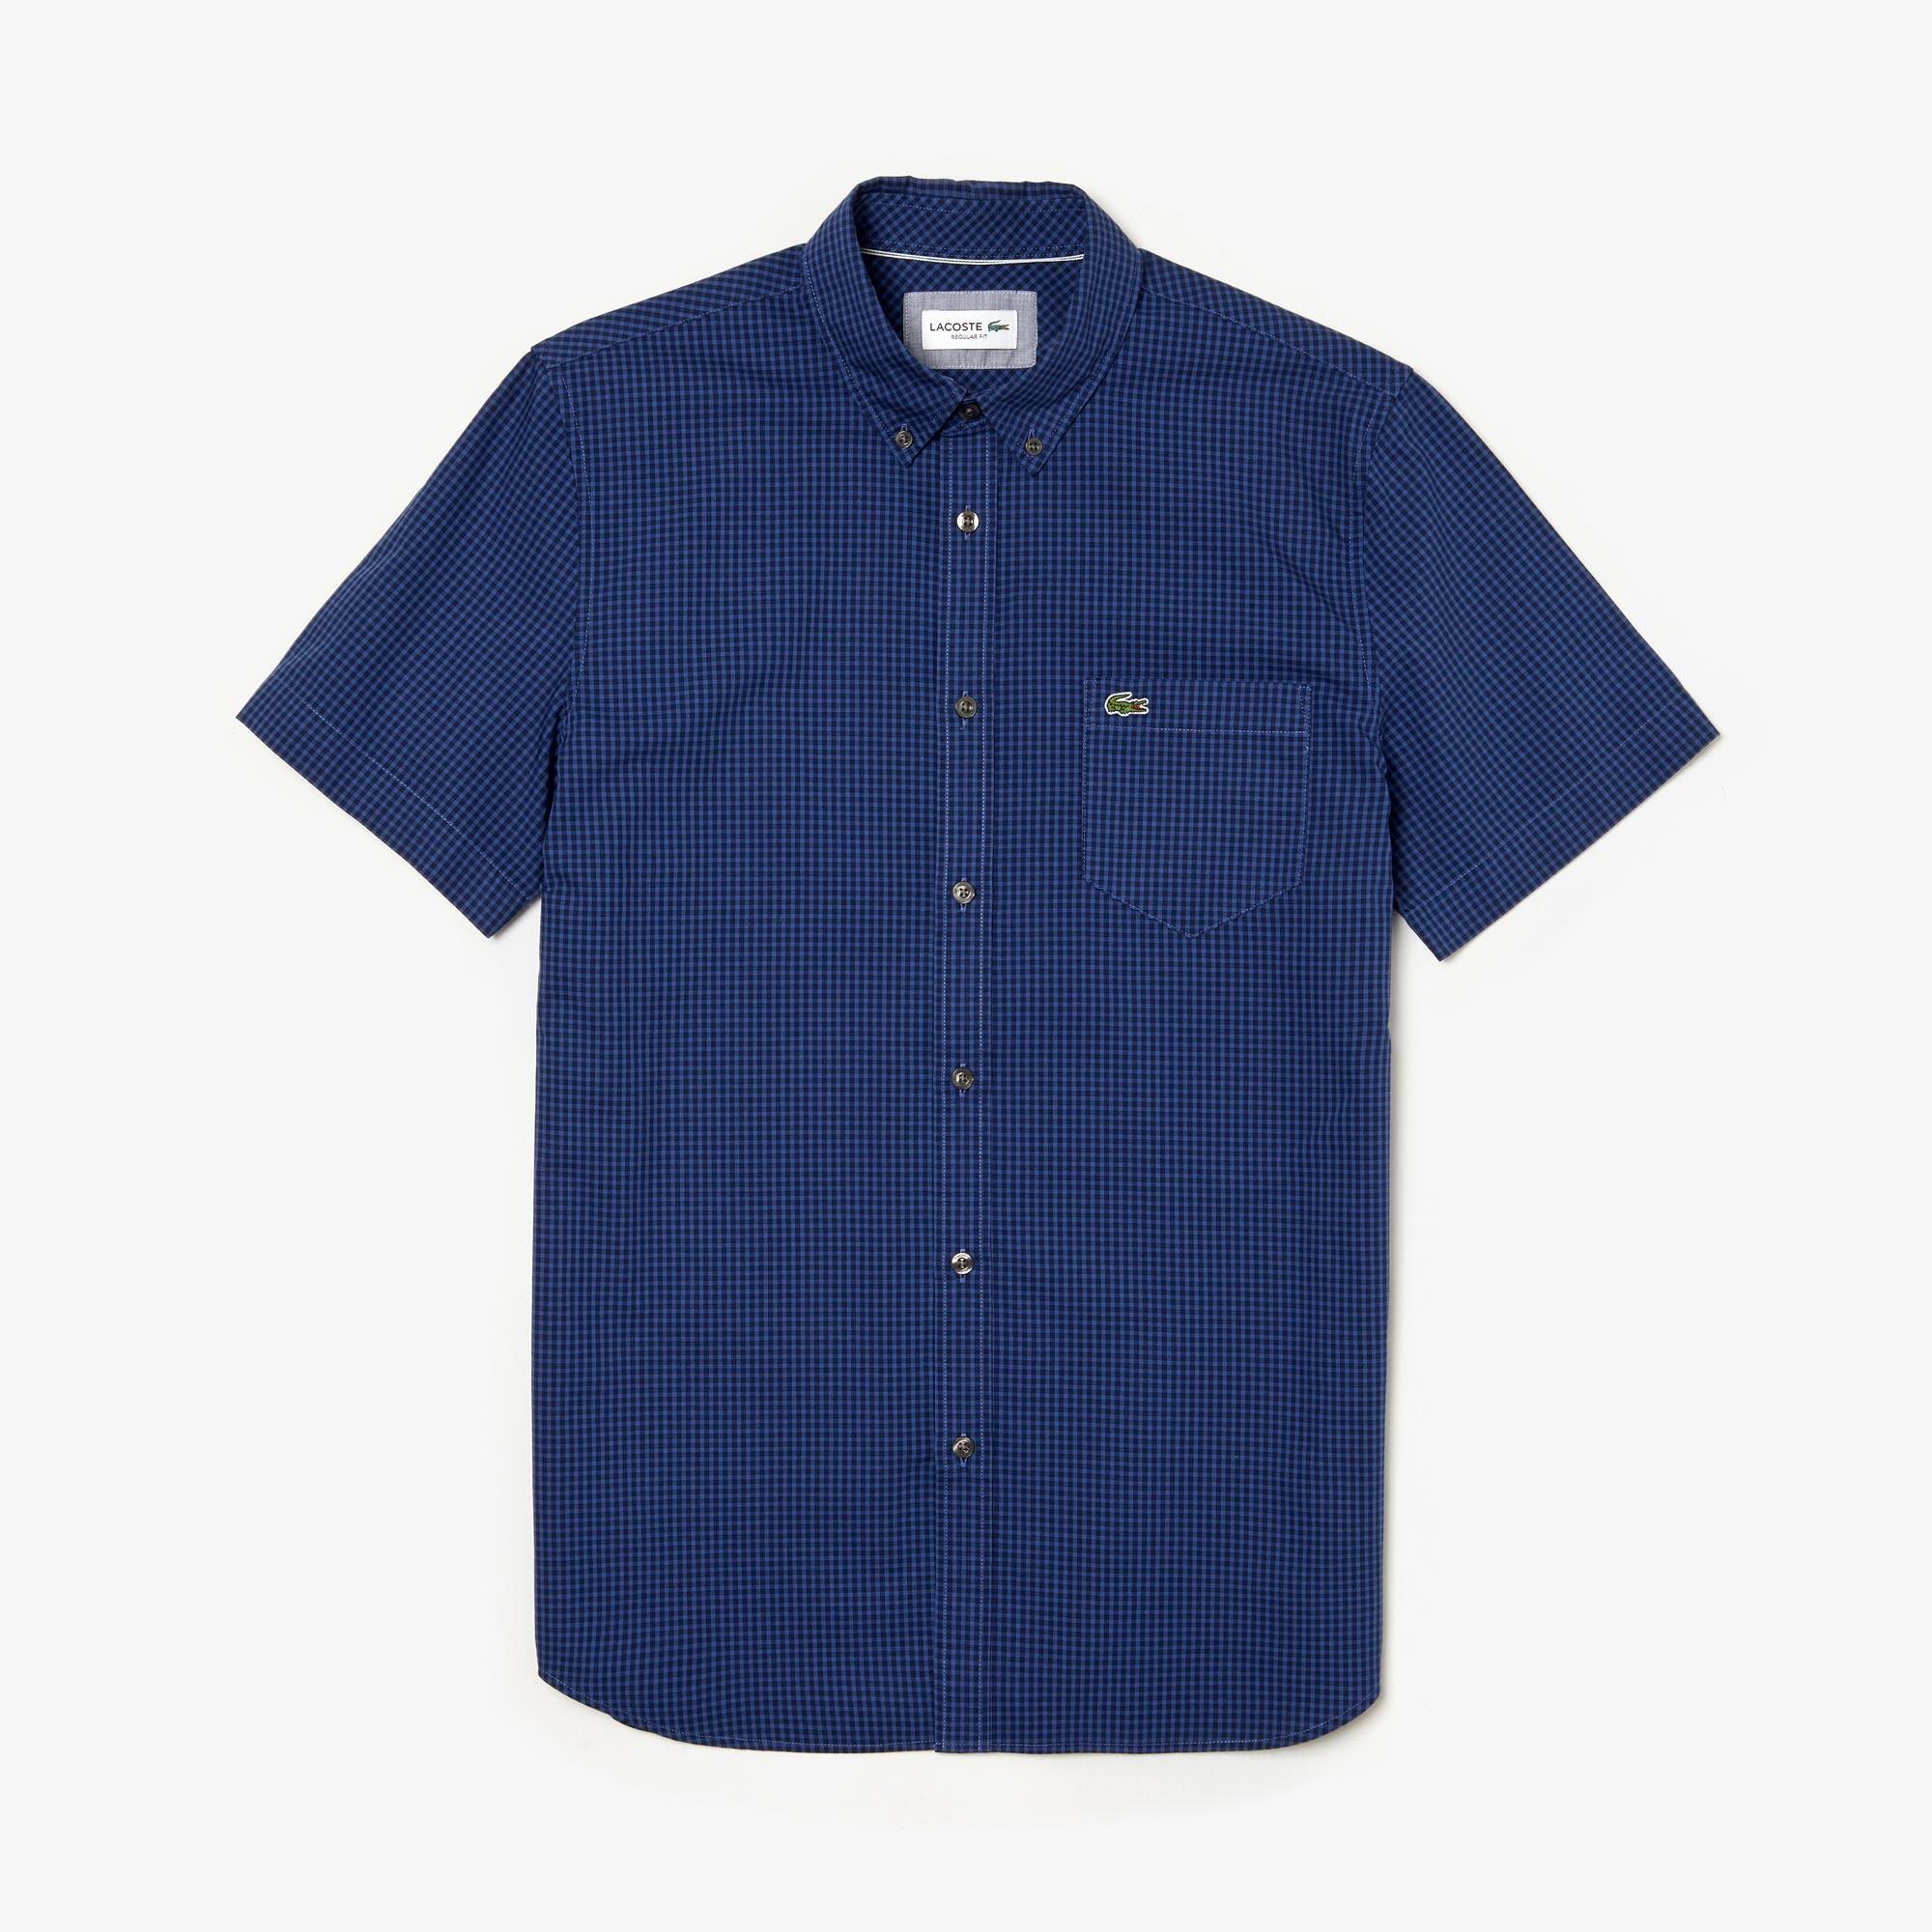 5a9aa1687ff4 Herren Regular Fit Hemd mit Karomuster. CHF 129,00 129.00 CHF. Farbe   NAVY  BLUE IODINE